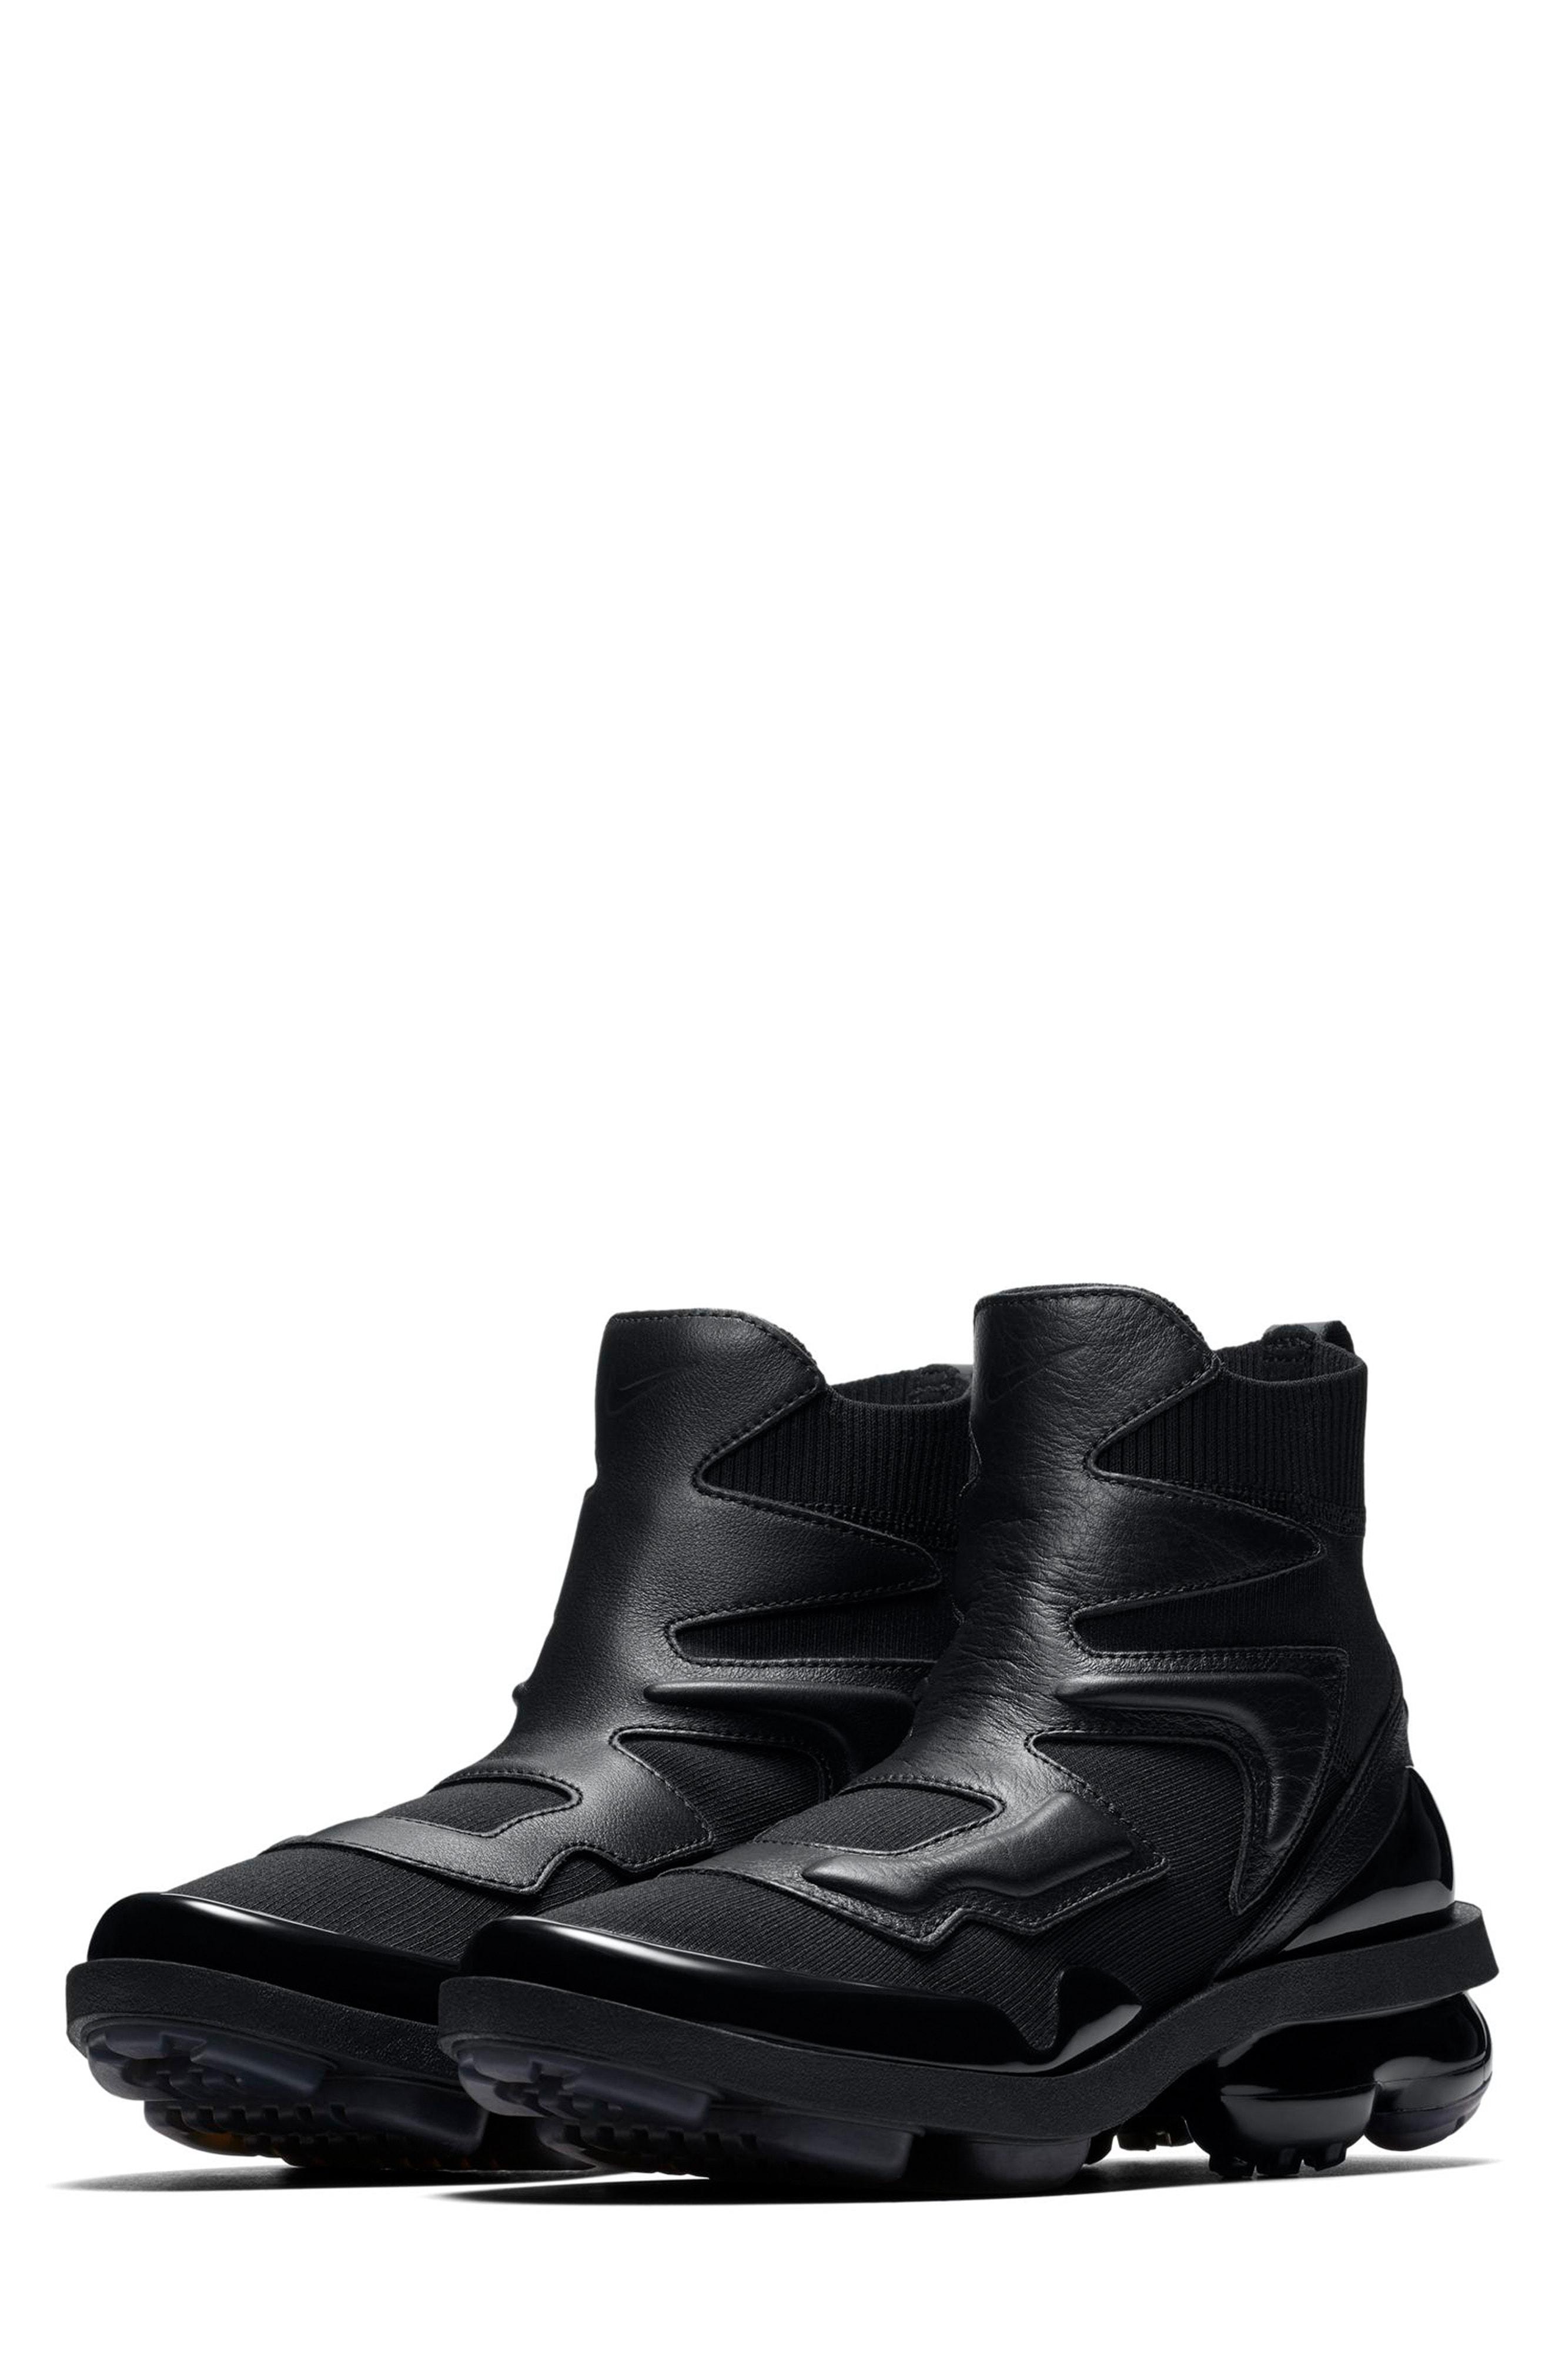 d3fd3e9d8ad Nike Air Vapormax Light Ii Sneaker In Black  Black